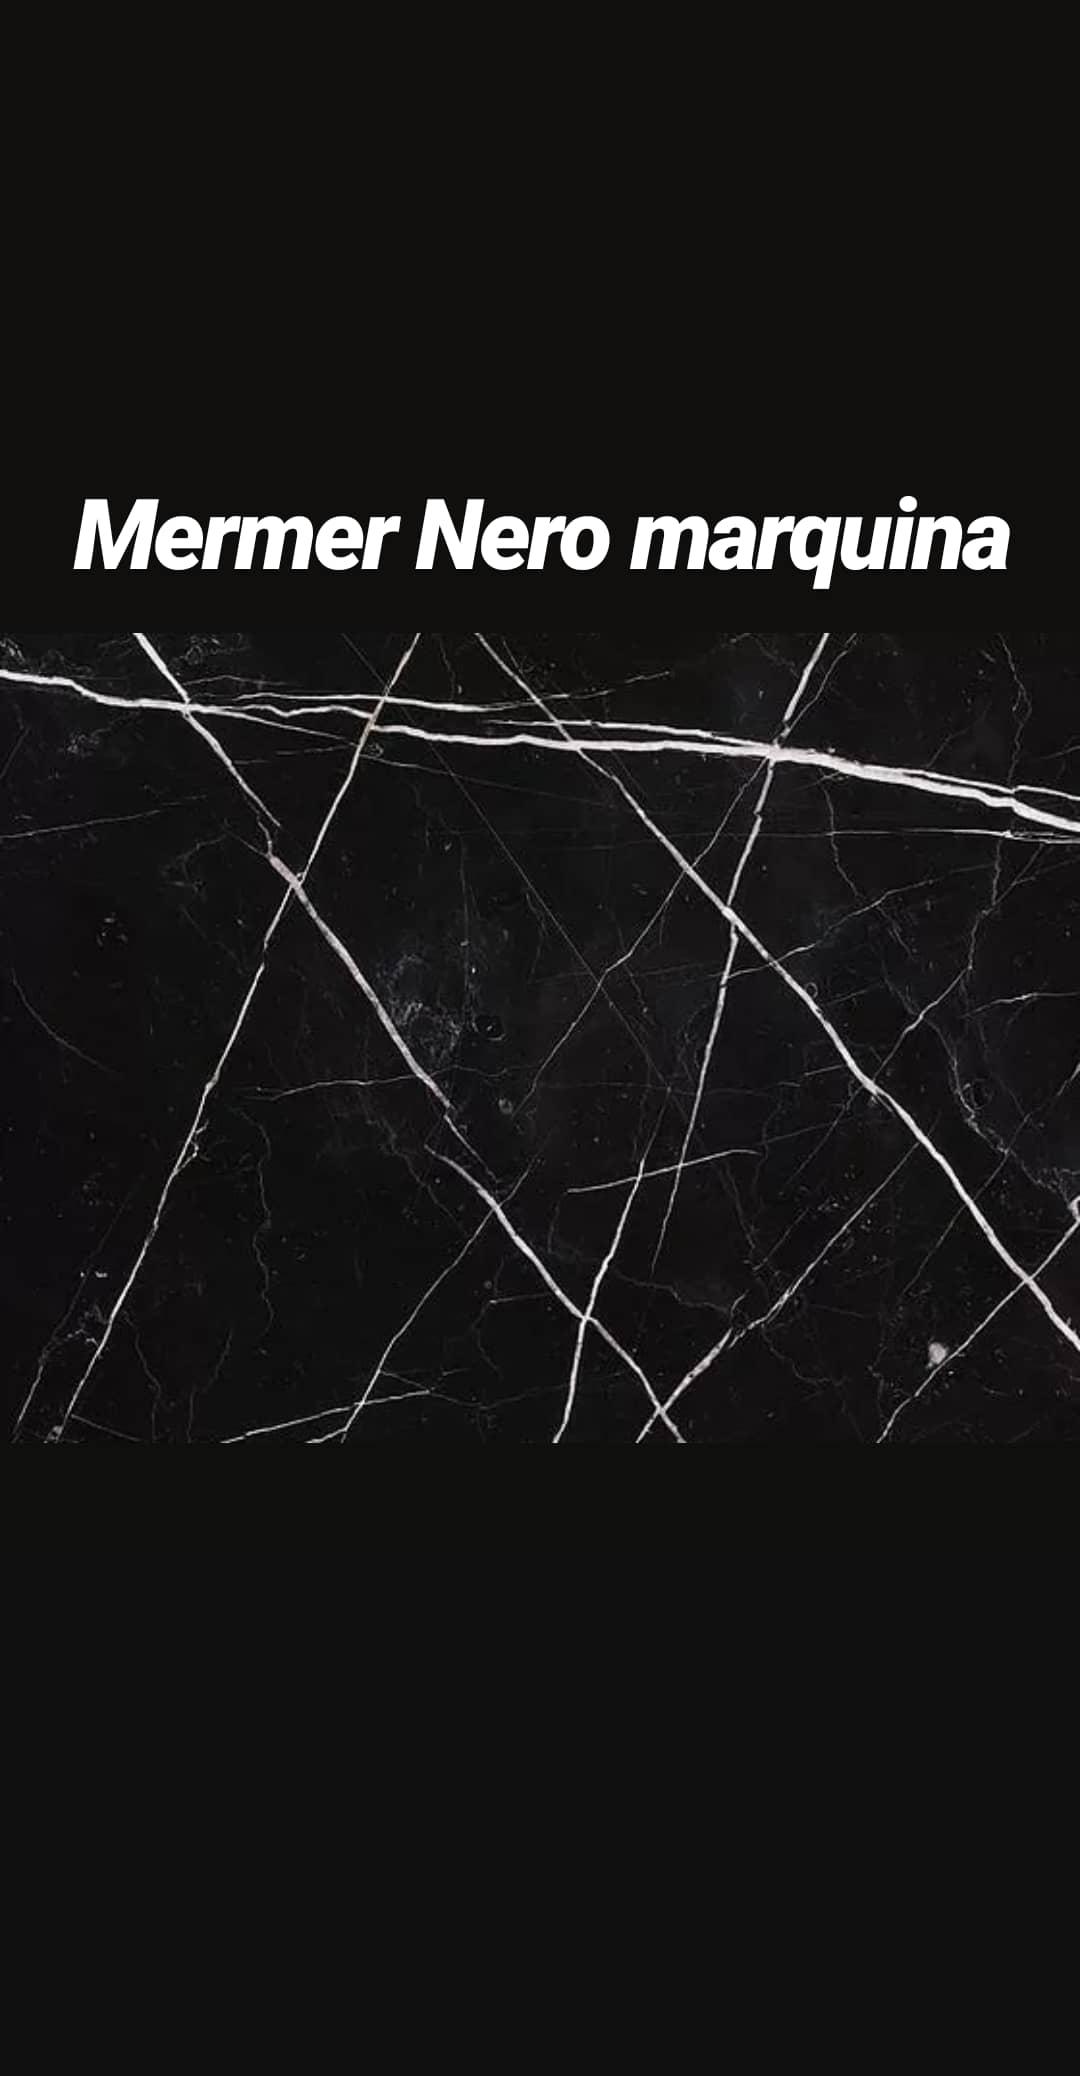 mermer-nero-marquina---0469de55b8bb3c07bf8880e39d7dacbee4bd3410